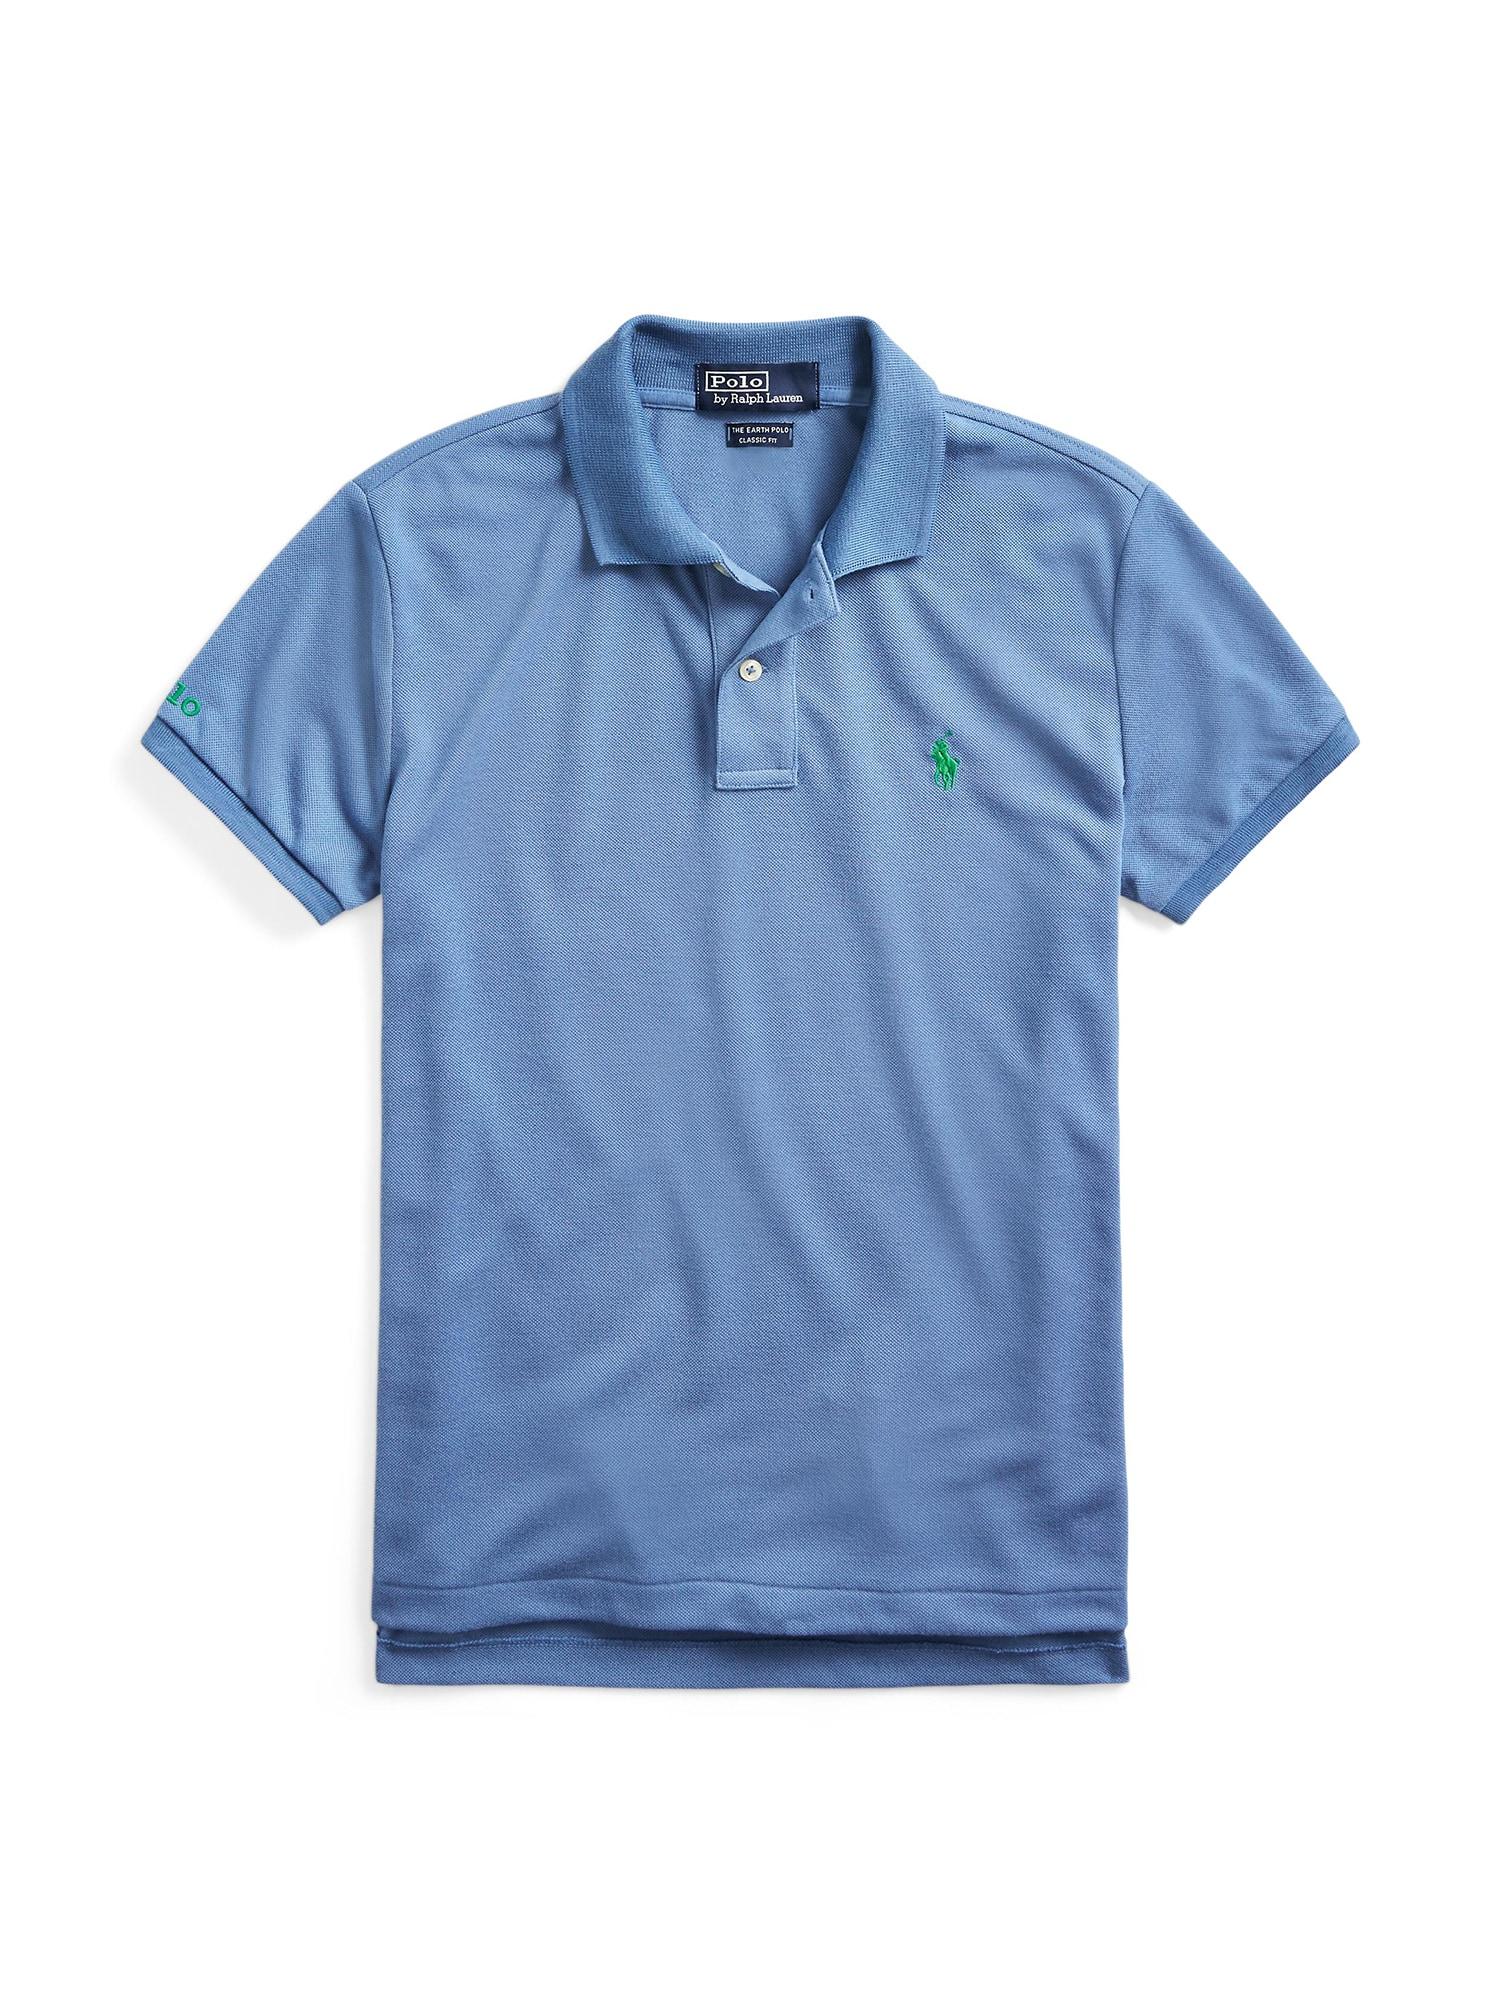 POLO RALPH LAUREN Marškinėliai 'CLASSIC FIT' mėlyna